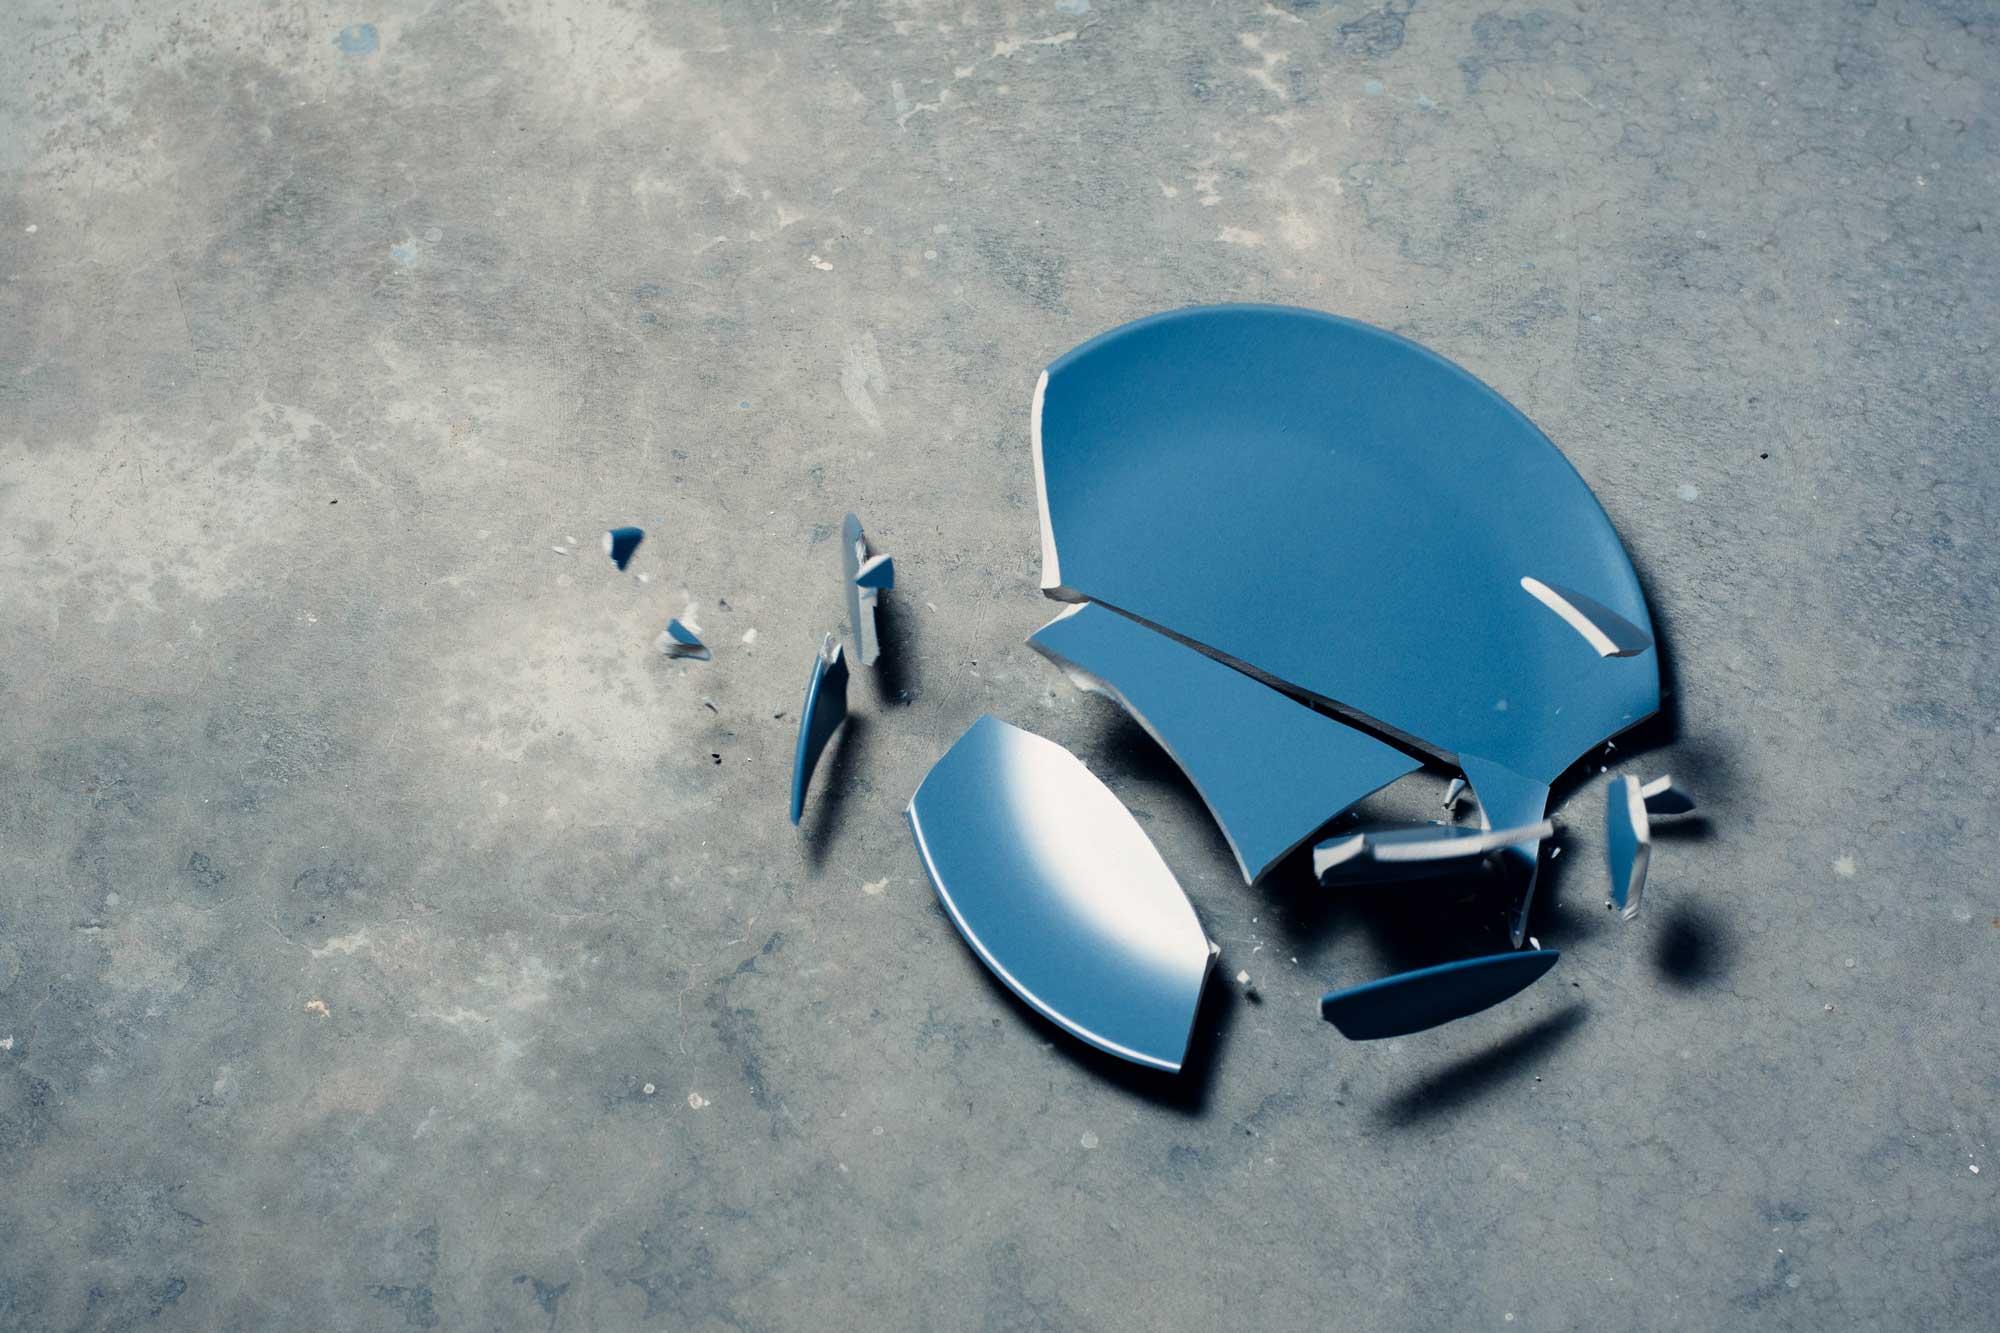 broken blue plate on concrete ground